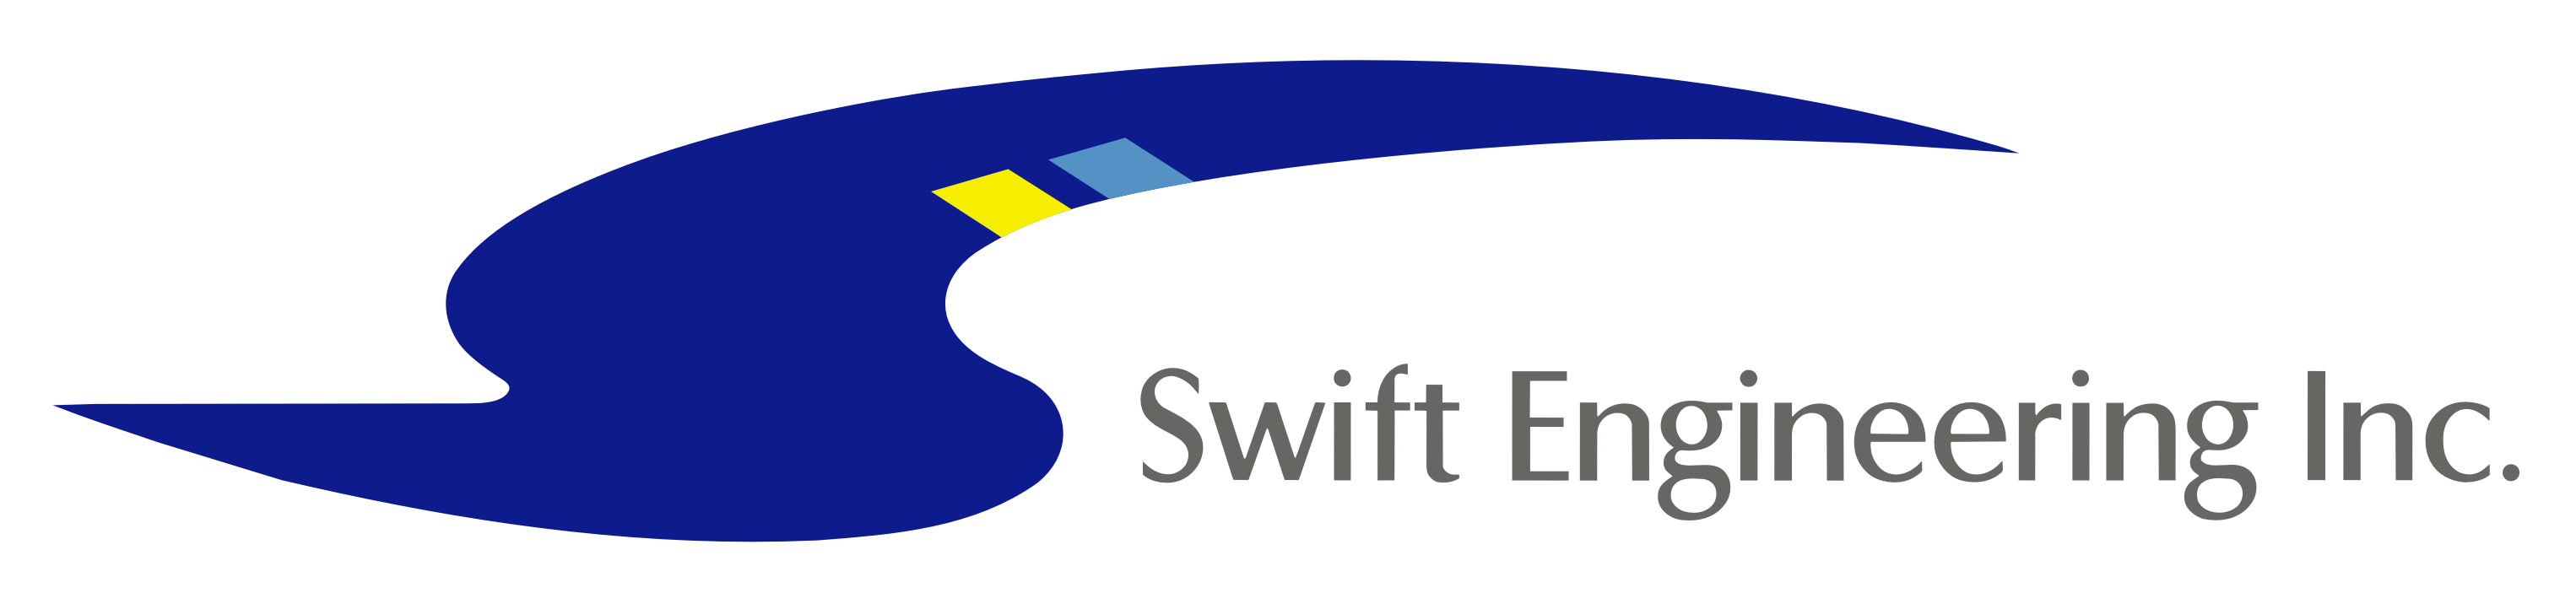 Jet Parts Engineering Inc Logo photo - 1